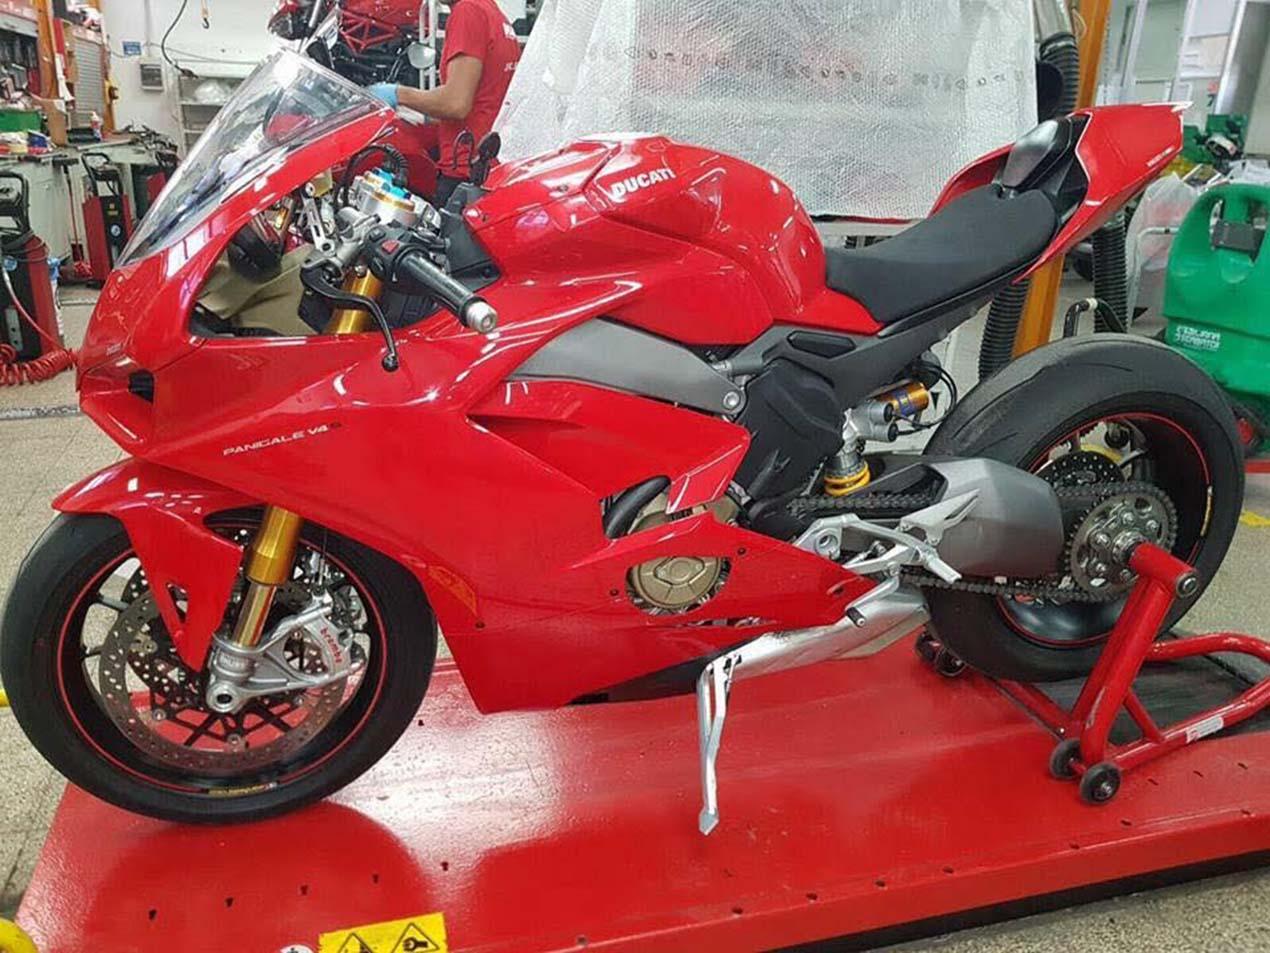 https://i1.wp.com/www.asphaltandrubber.com/wp-content/uploads/2017/09/Ducati-Panigale-V4-superbike-01.jpg